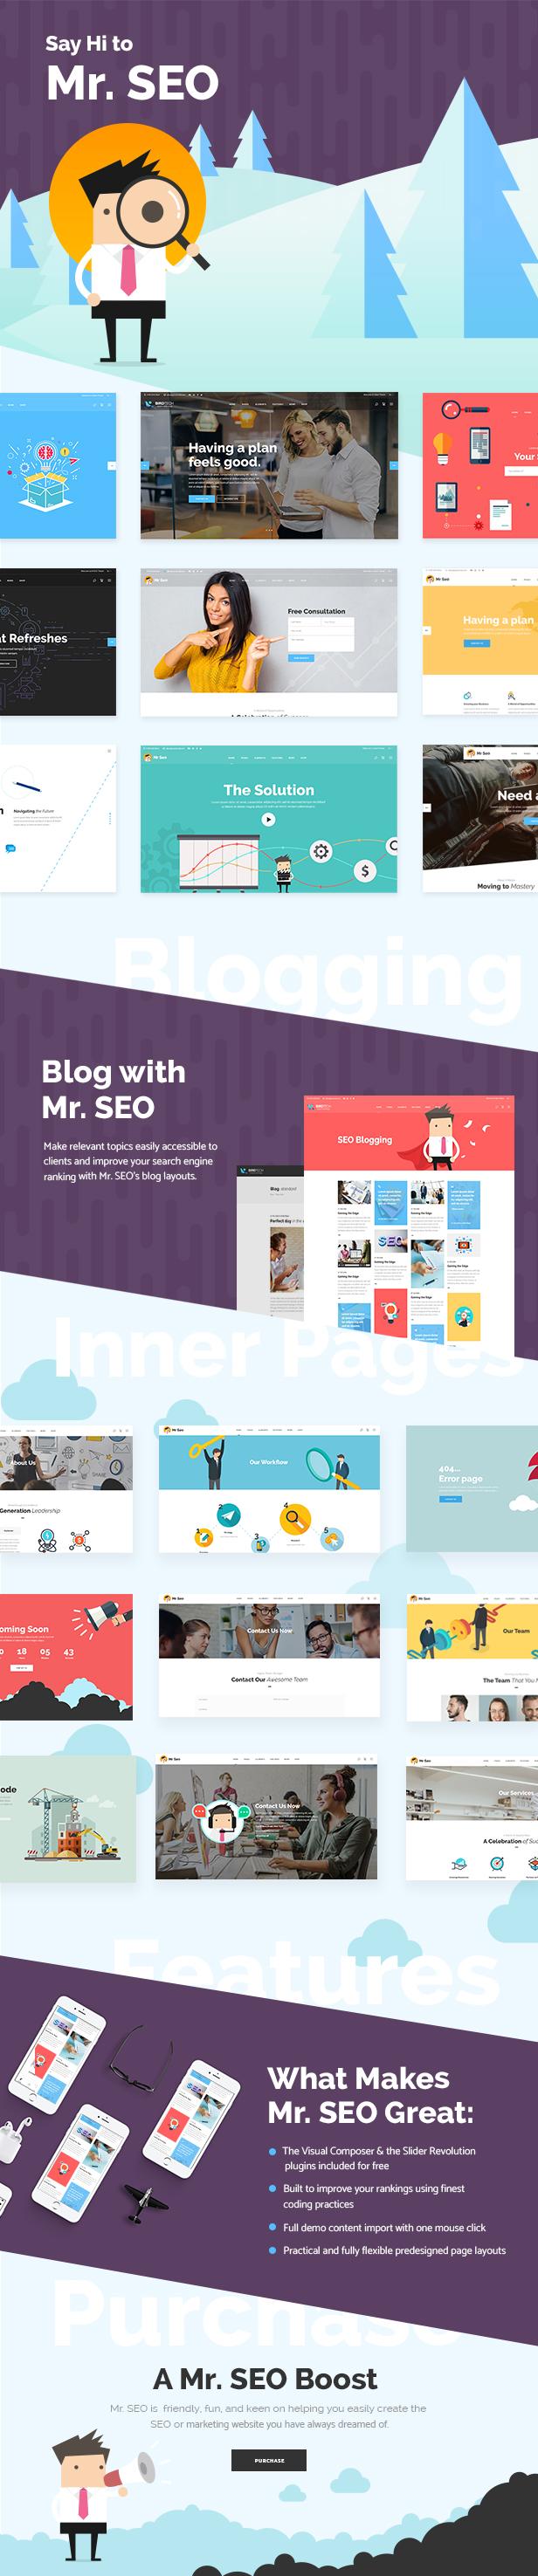 Mr. SEO - SEO & Social Media Marketing Agency Theme - 1